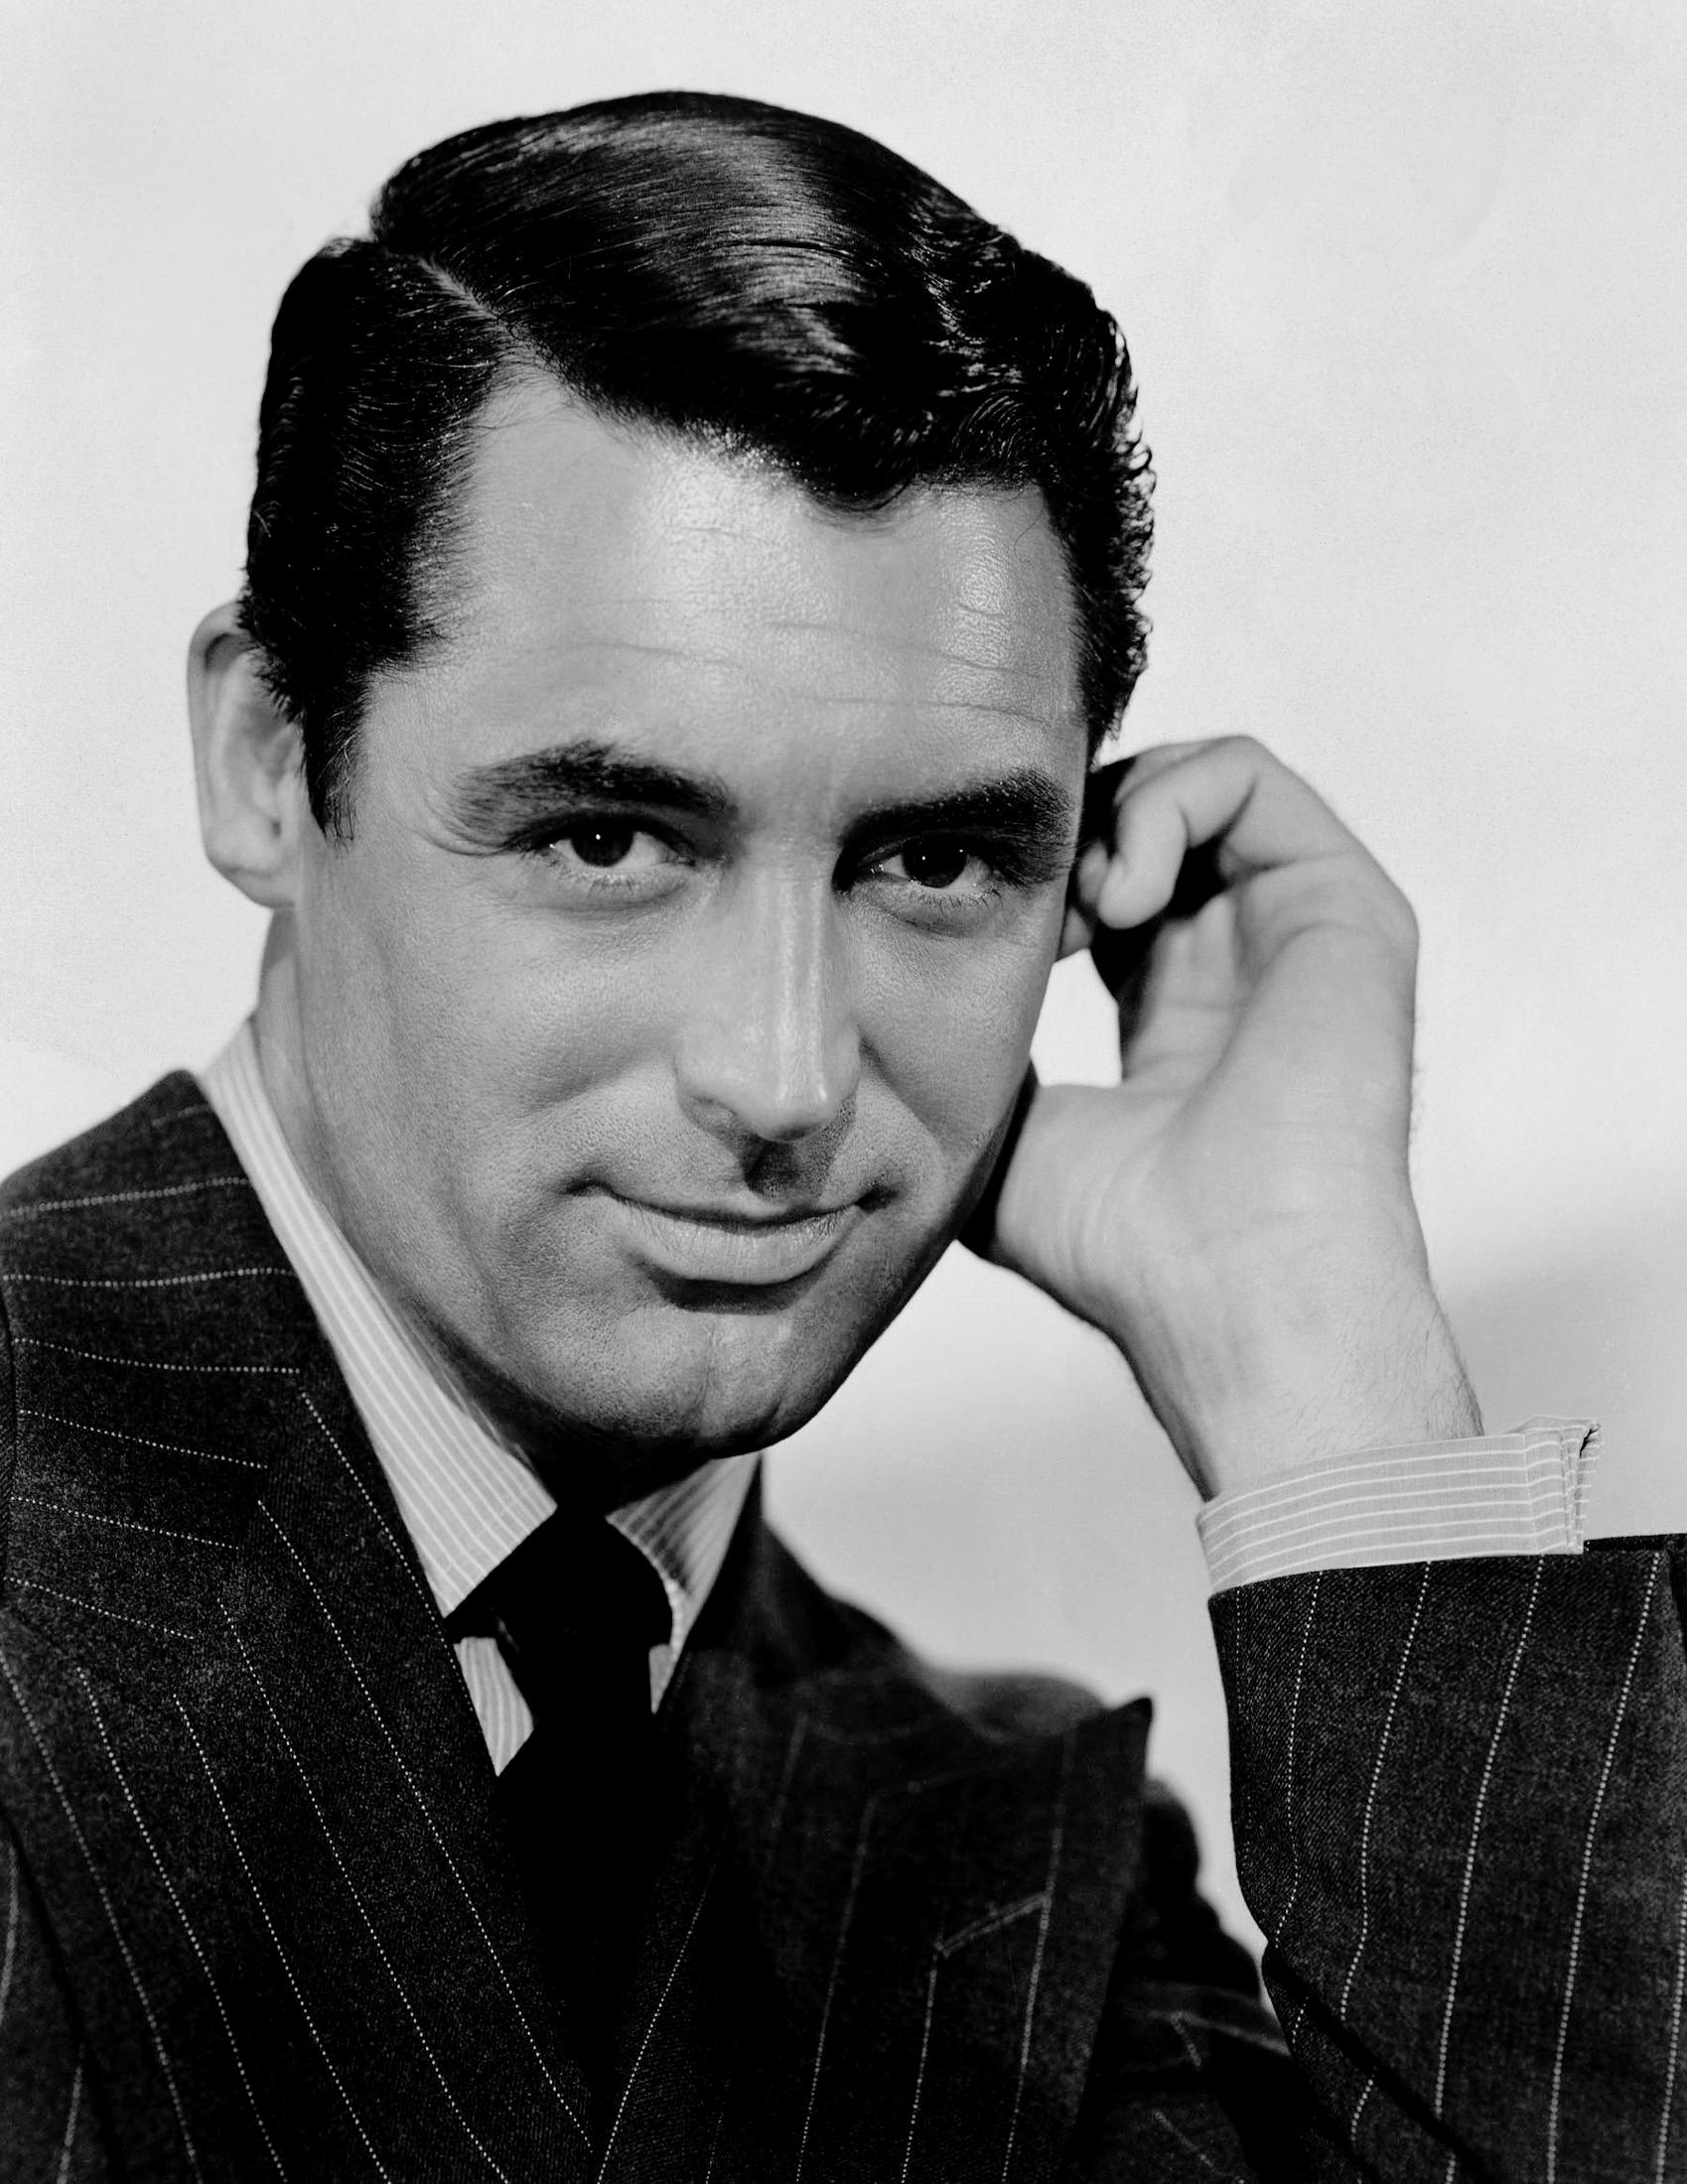 Cary Grant, sinema oyuncusu. tarihte bugün